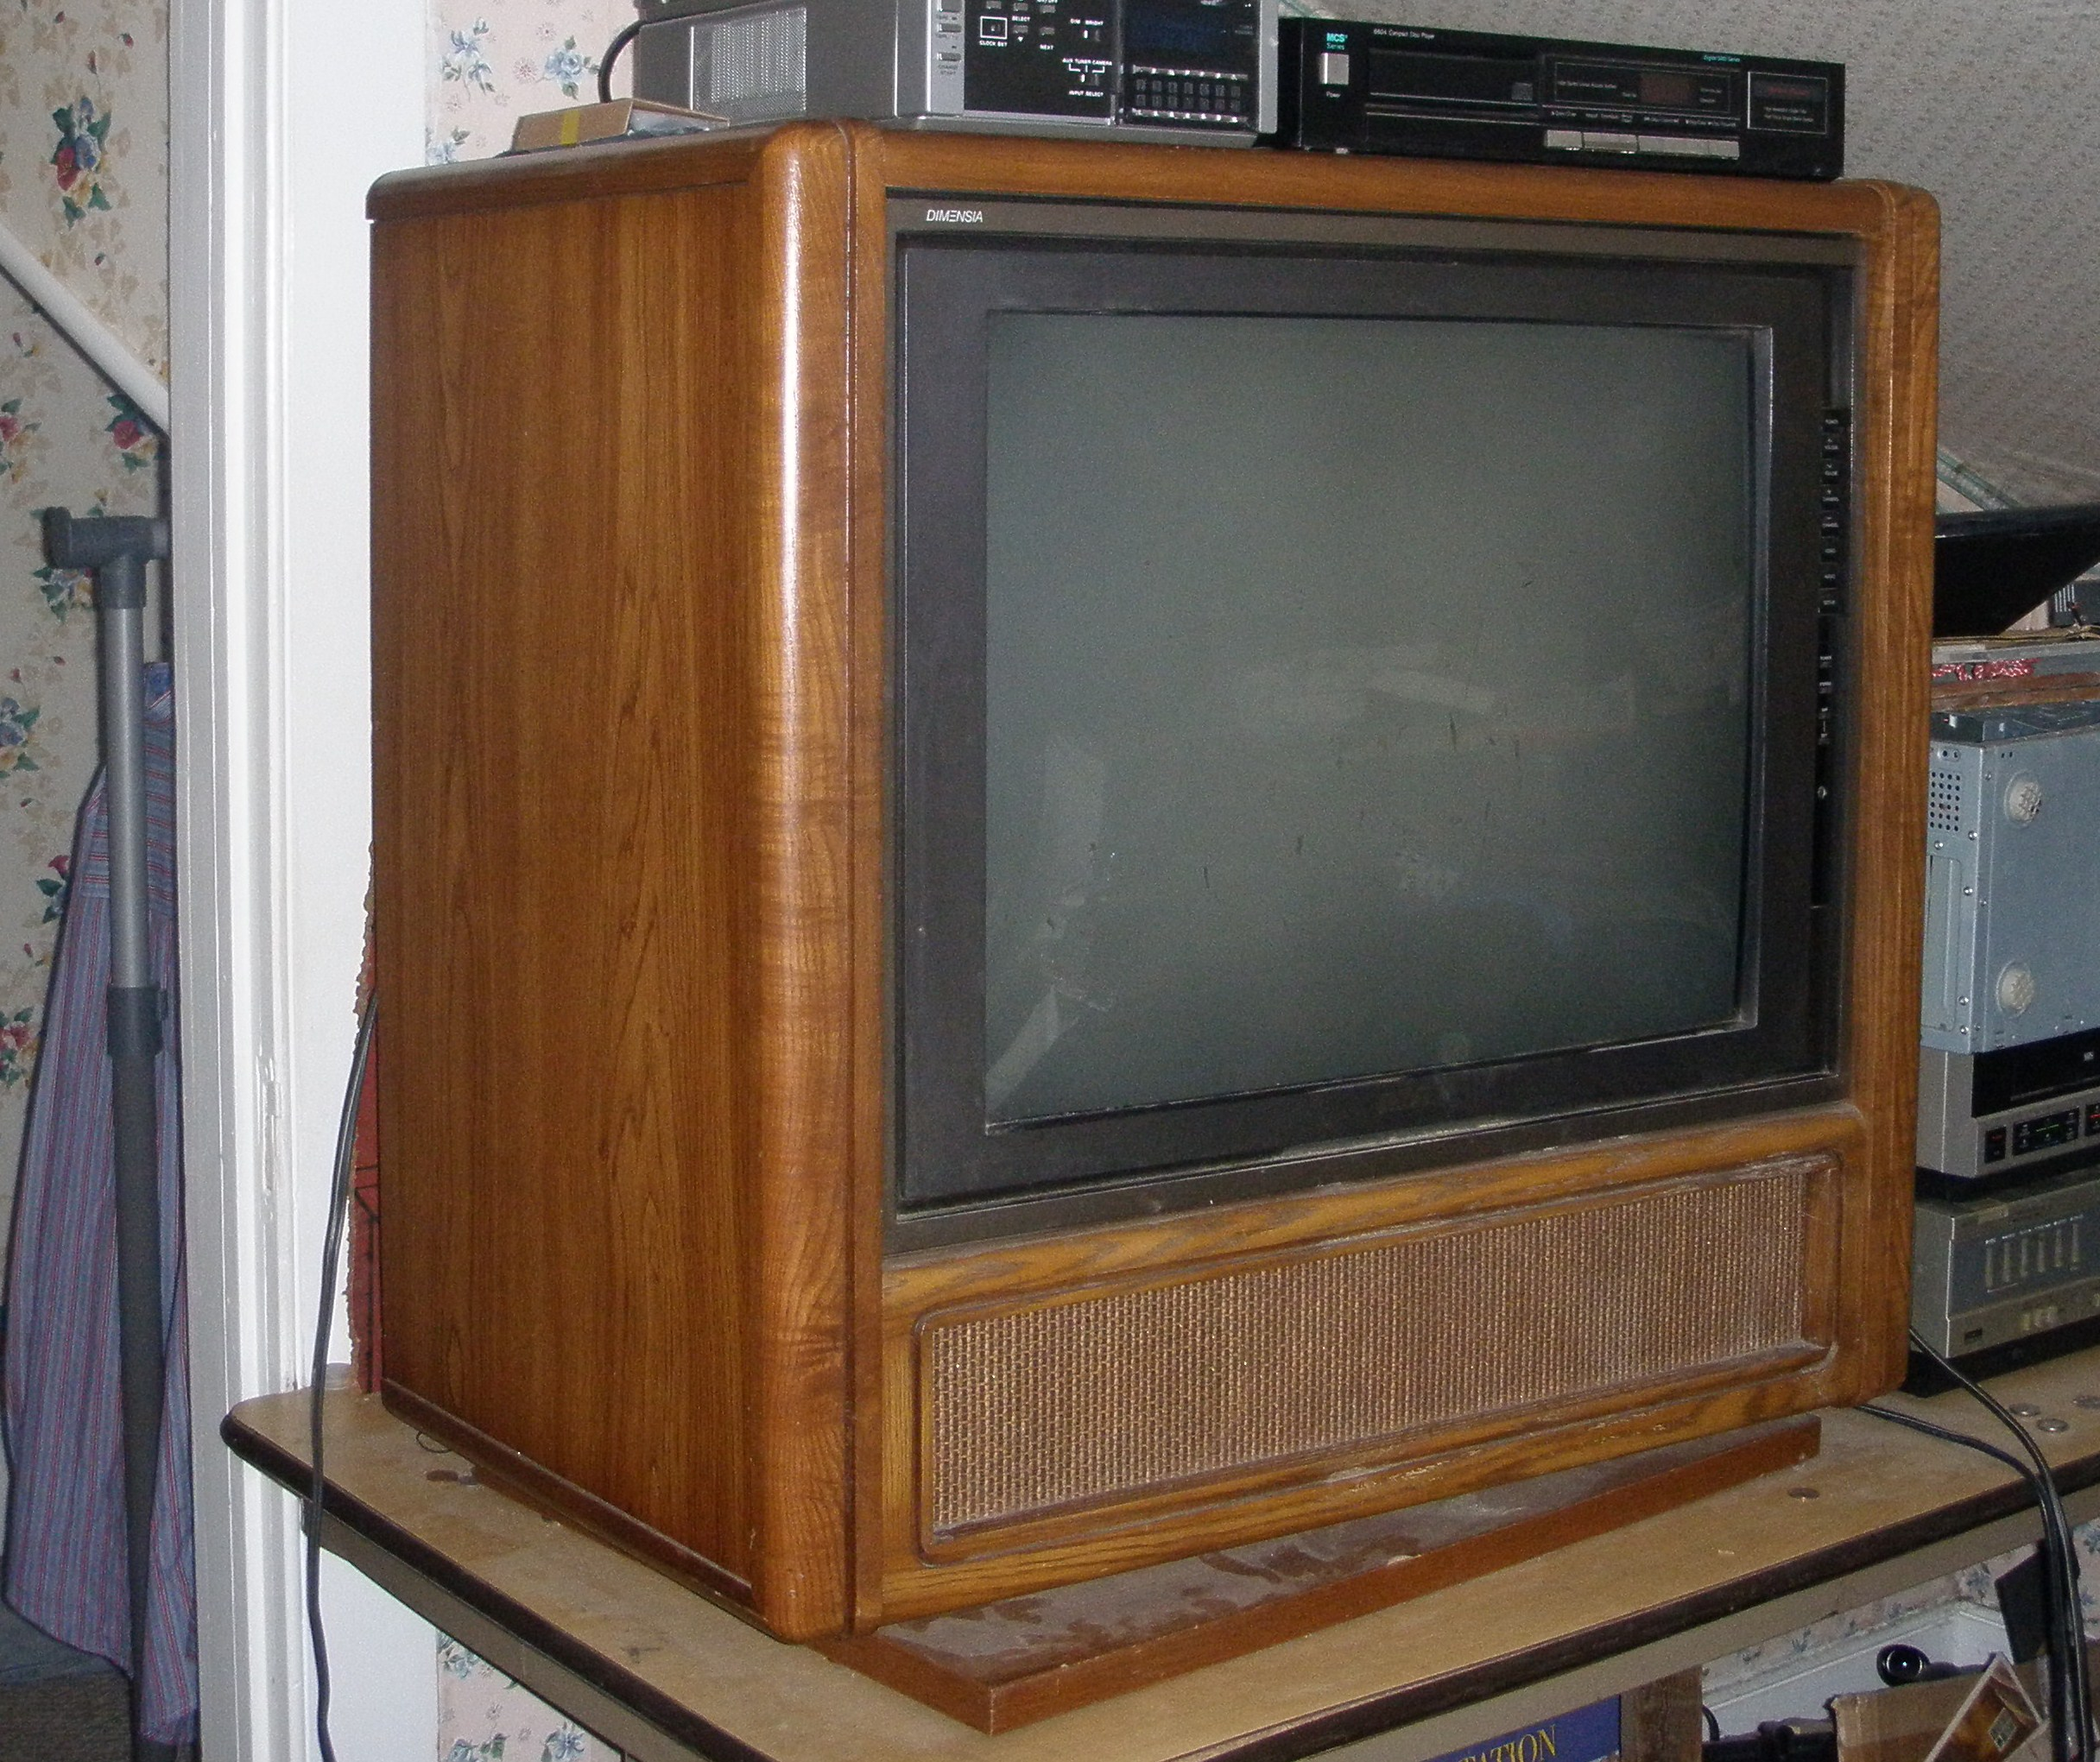 cd464fc8f File:1987 RCA Dimenisa console TV set.JPG - Wikimedia Commons